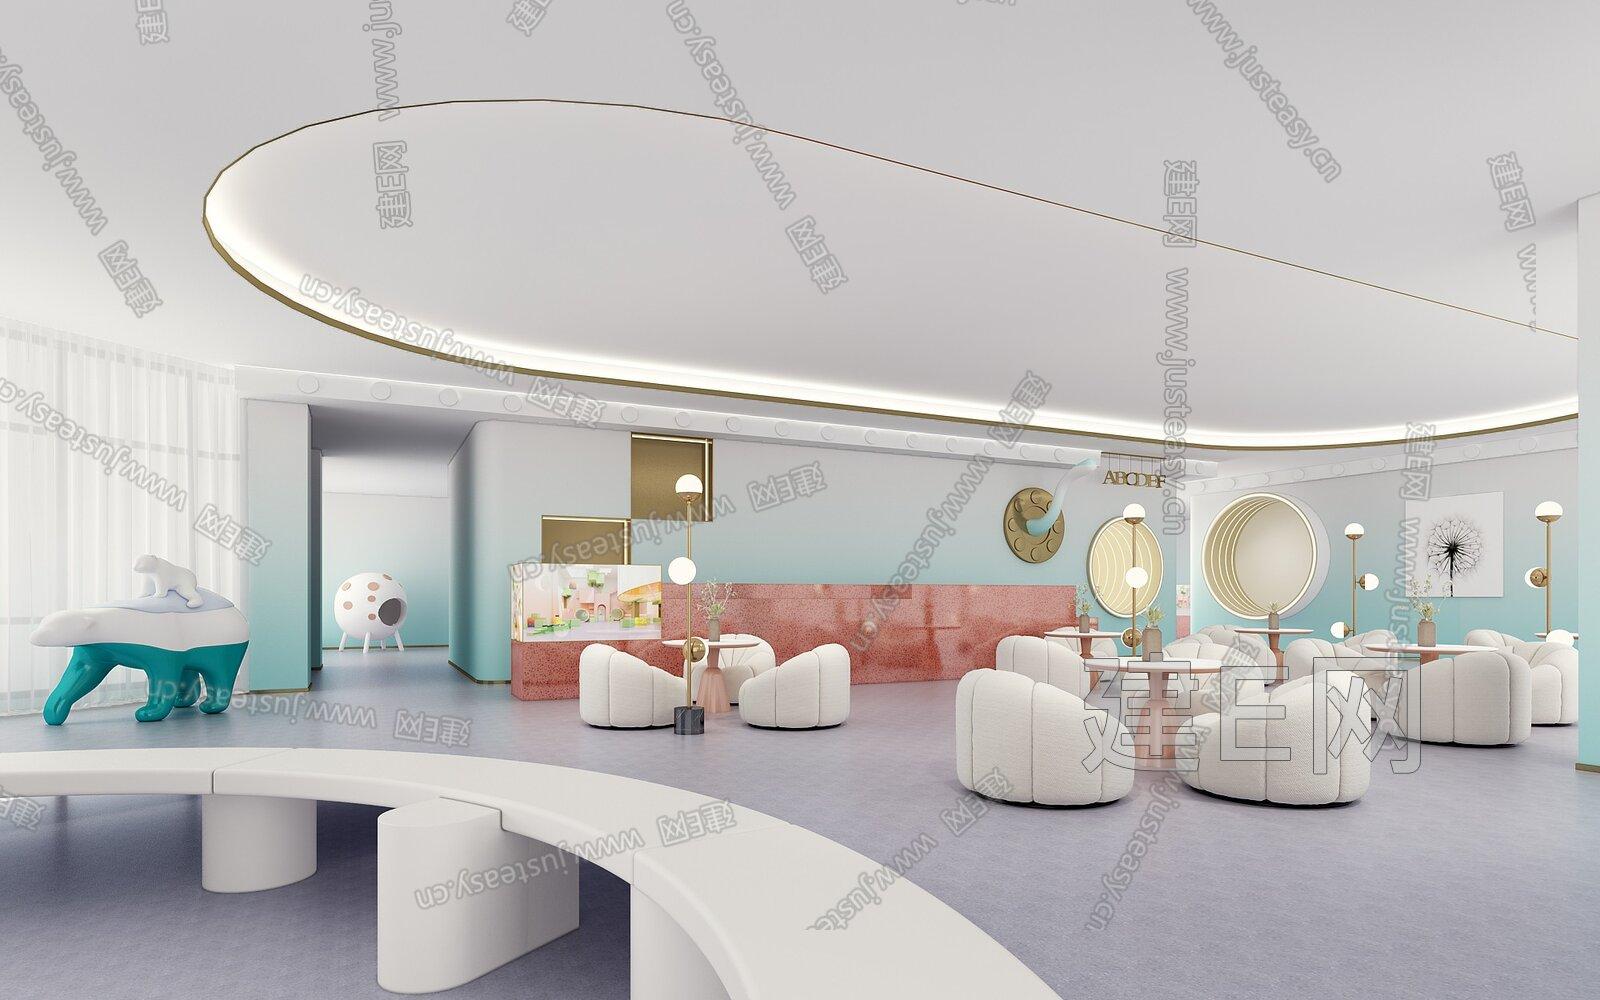 MOD 墨设设计 现代售楼处休闲区3d模型